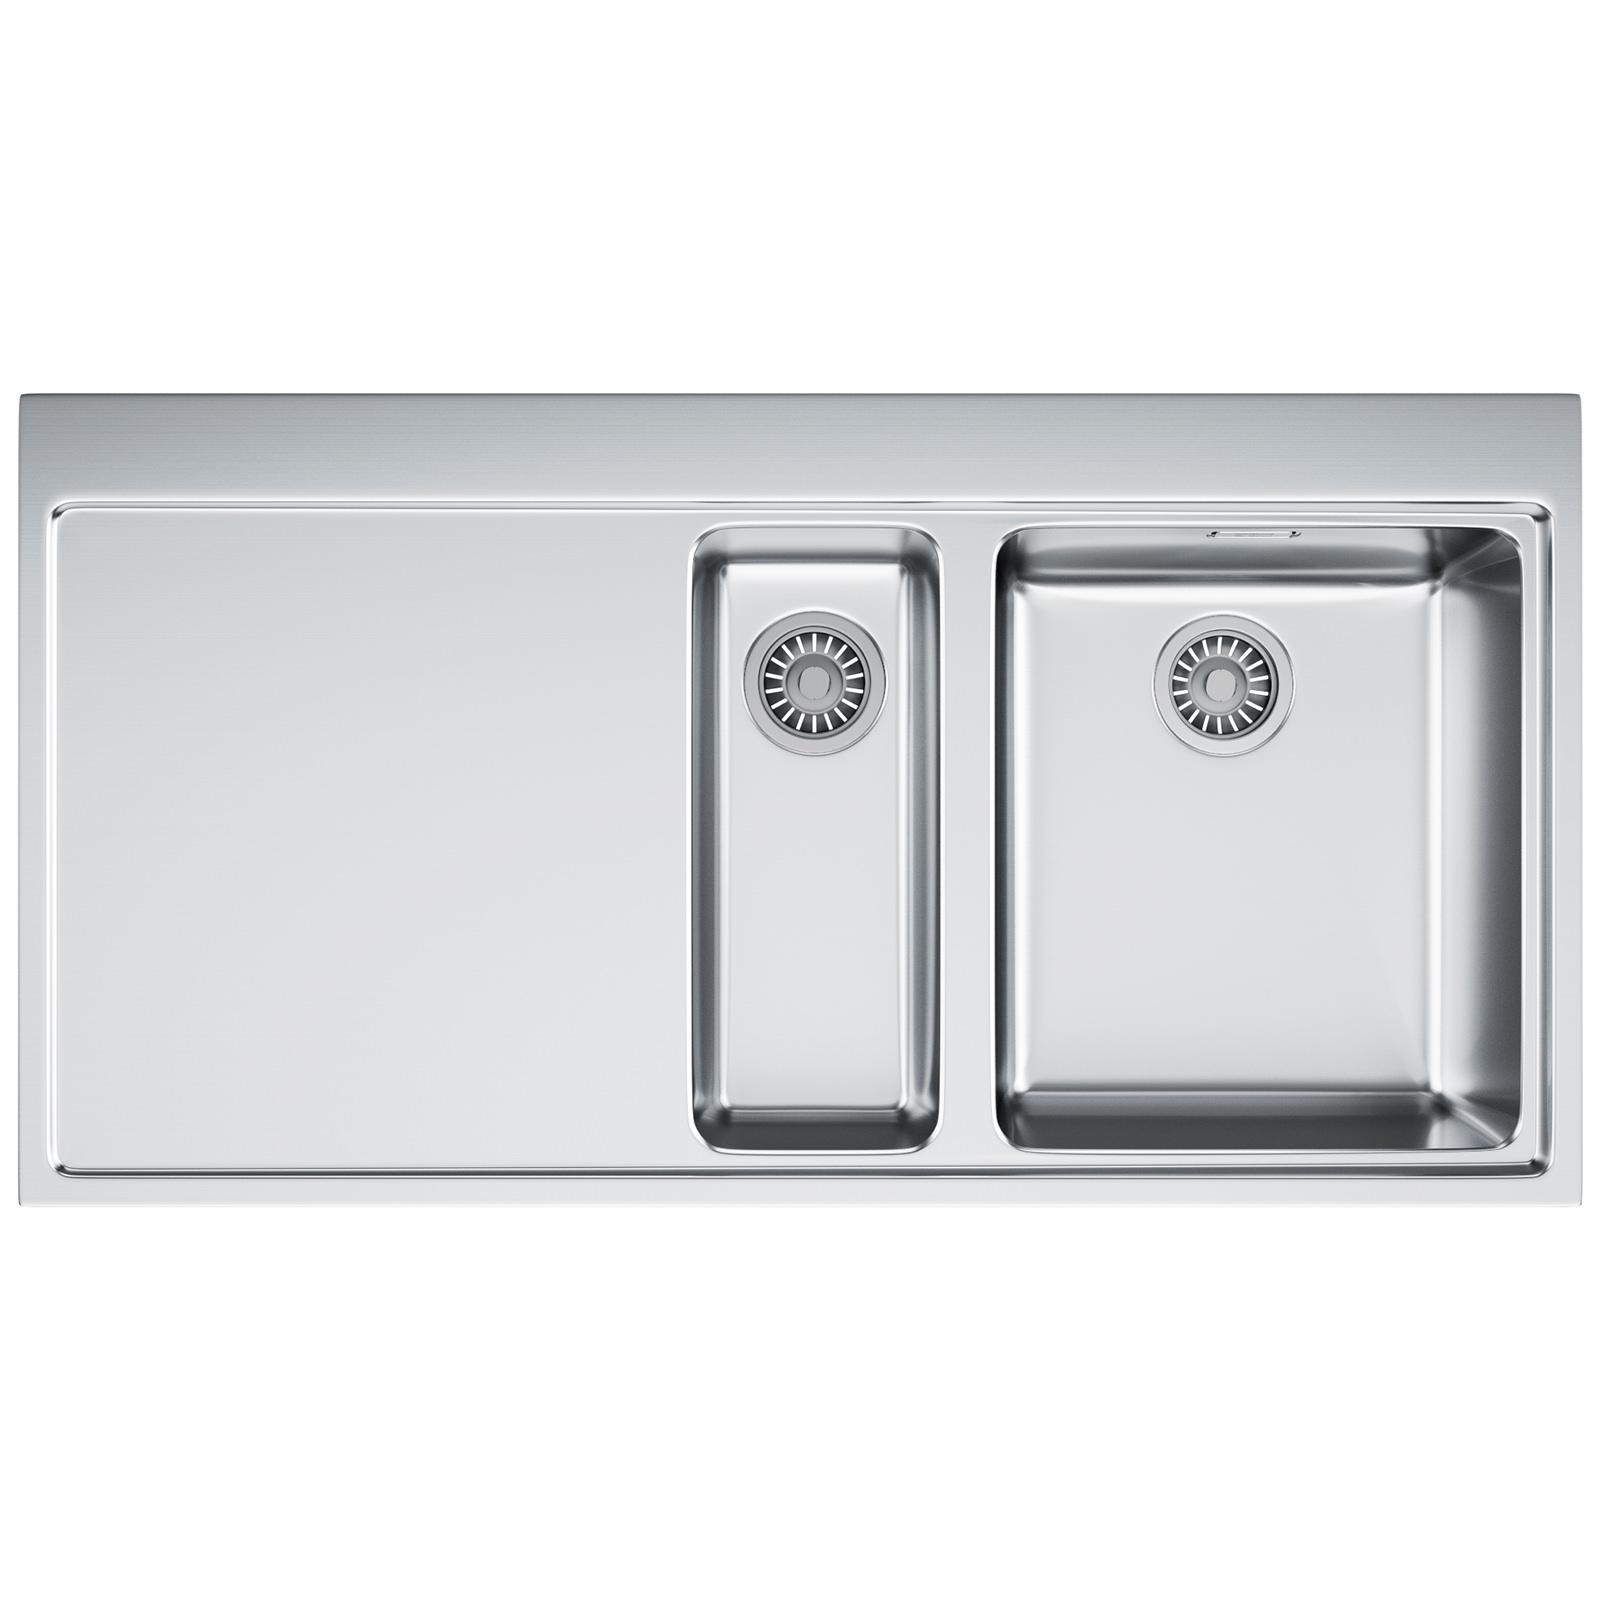 franke mythos mmx 251 stainless steel left hand drainer 15 bowl inset sink - Franke Sink